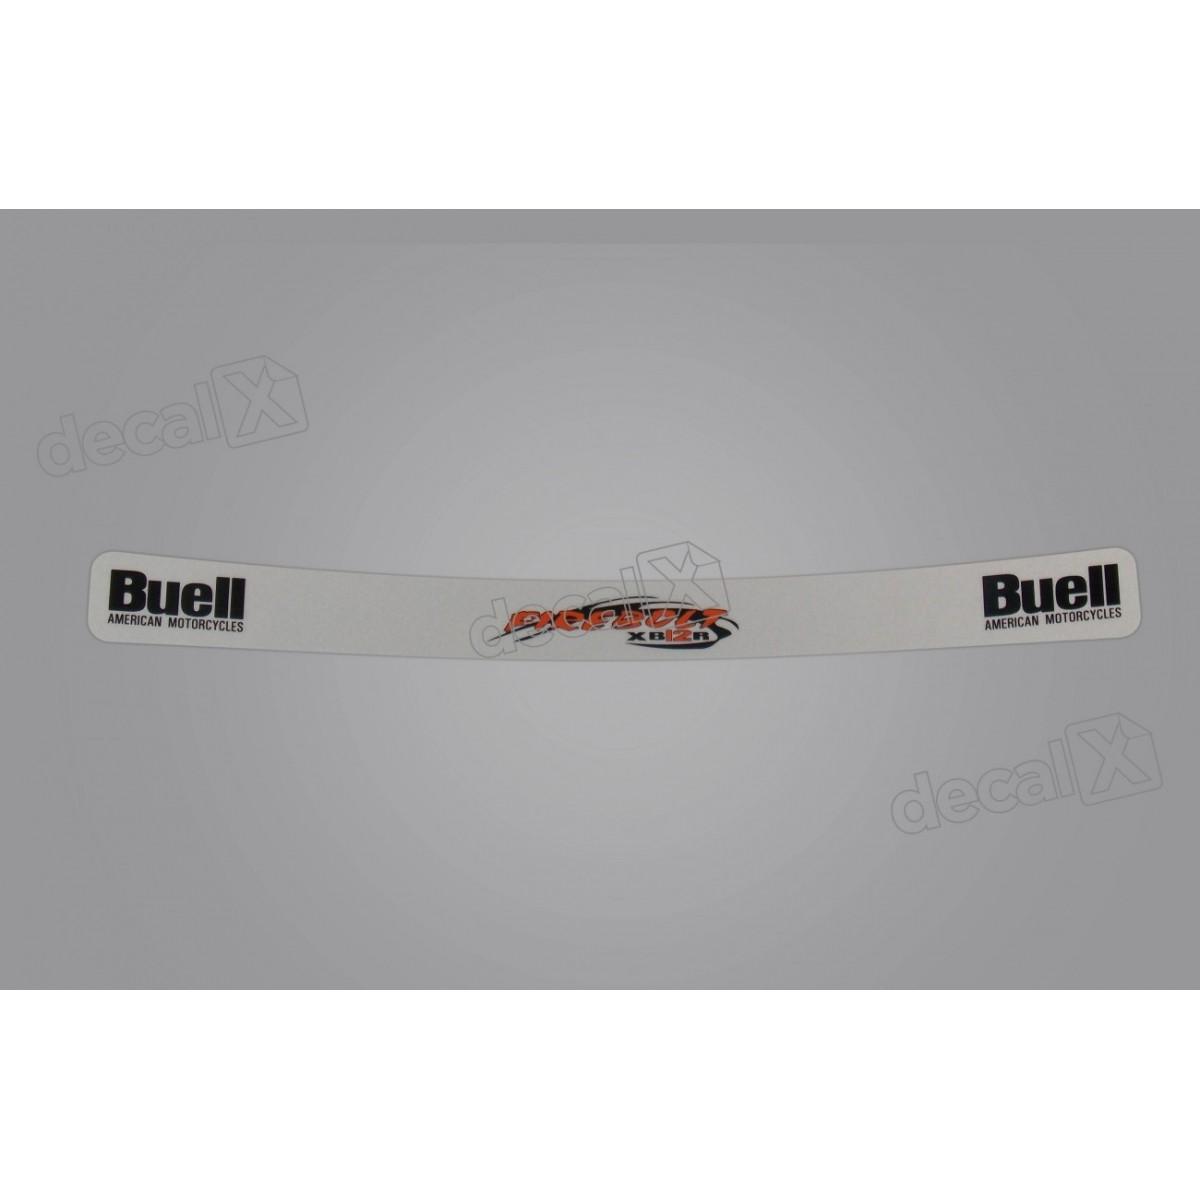 Adesivo Capacete Viseira Refletivo Buell 22x2 Cms Vis04